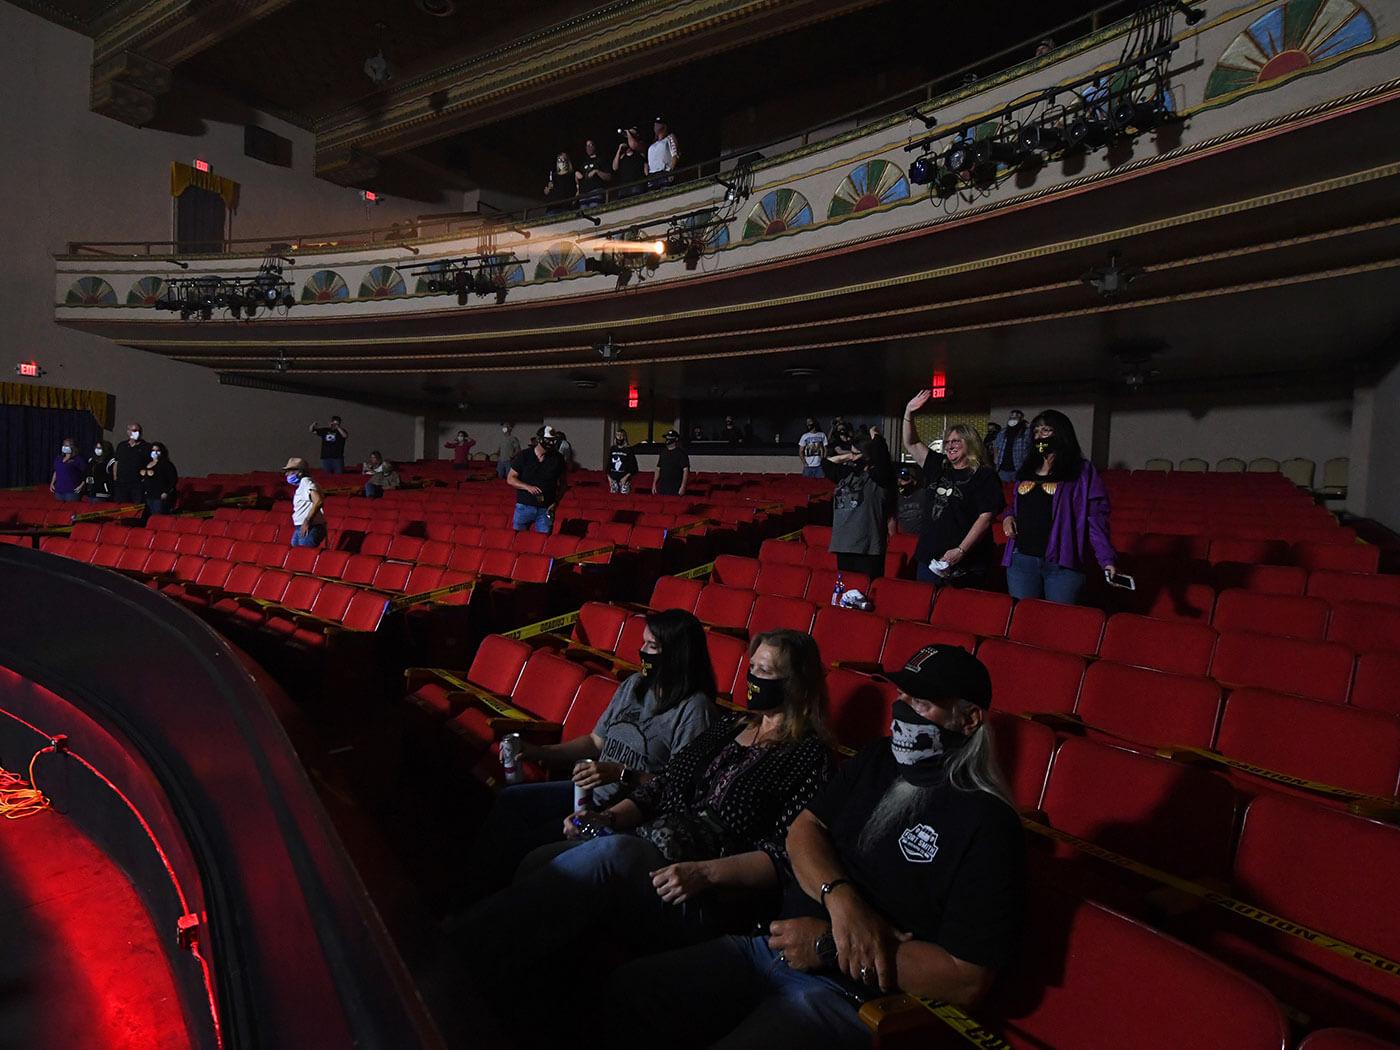 Audience members sat apart in the auditorium